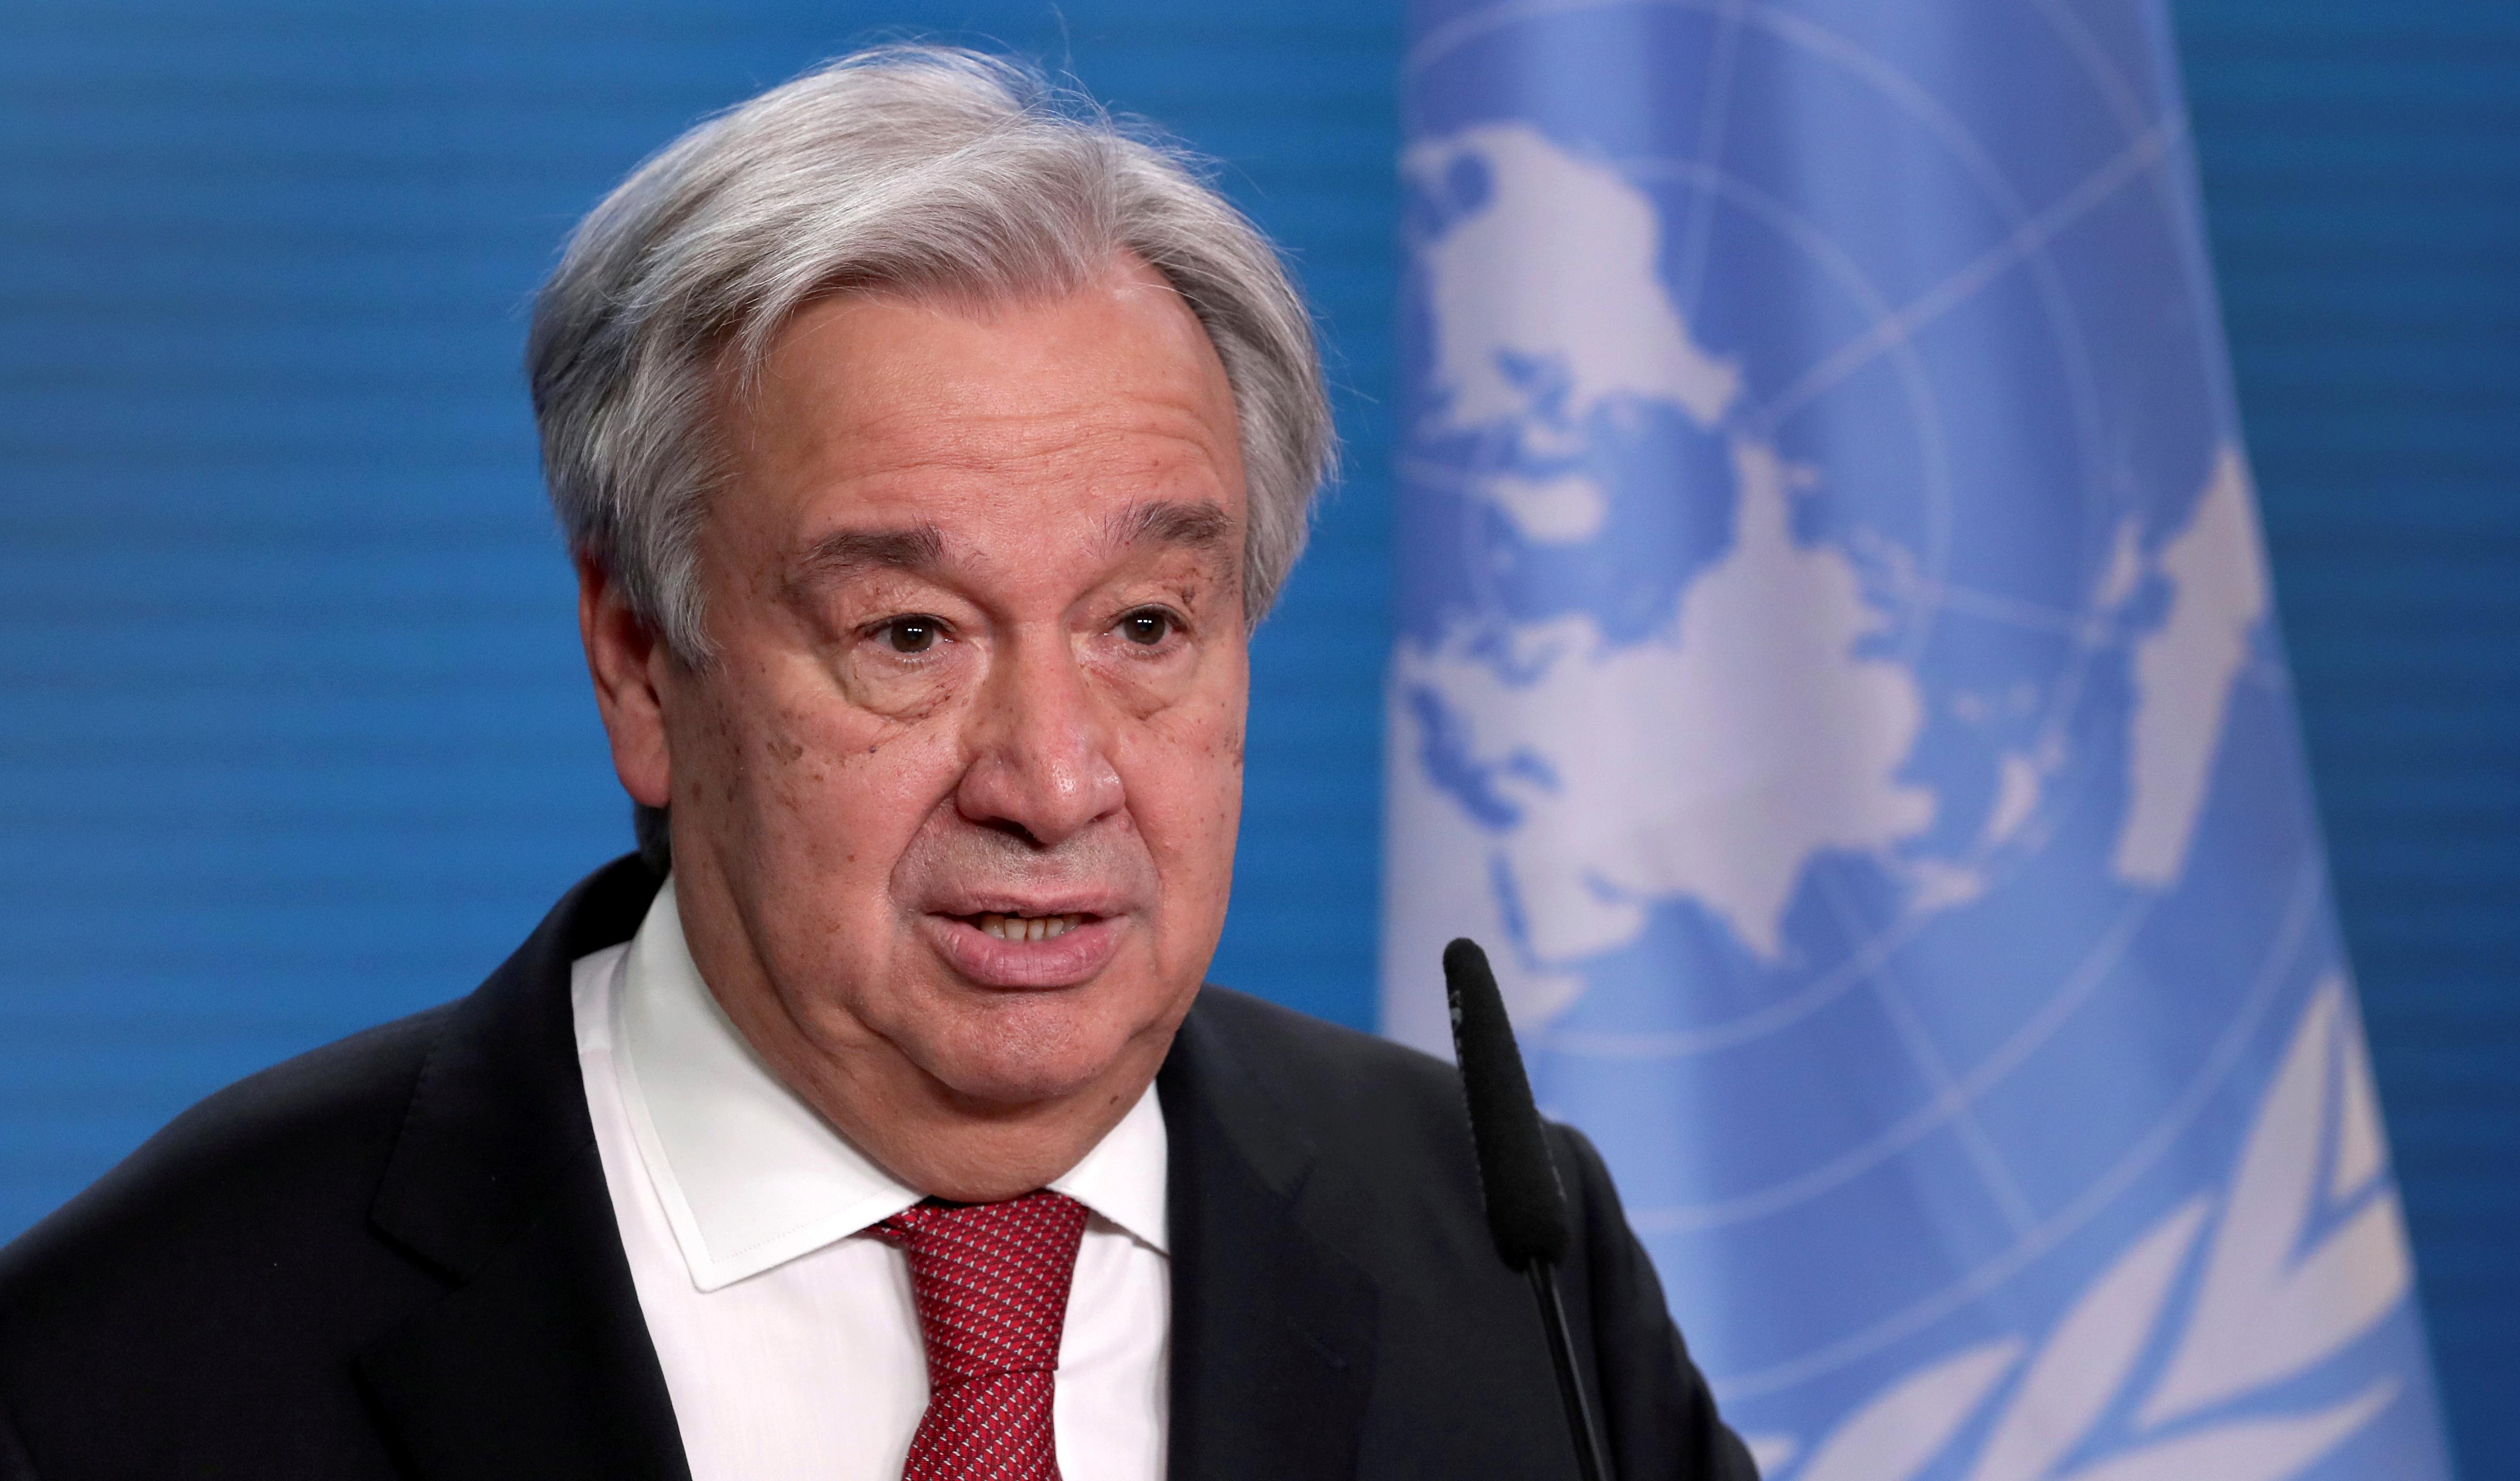 U.N. Secretary-General Antonio Guterres addresses the media during a news conference in Berlin, Germany, December 17, 2020. Michael Sohn/Pool via REUTERS/File Photo